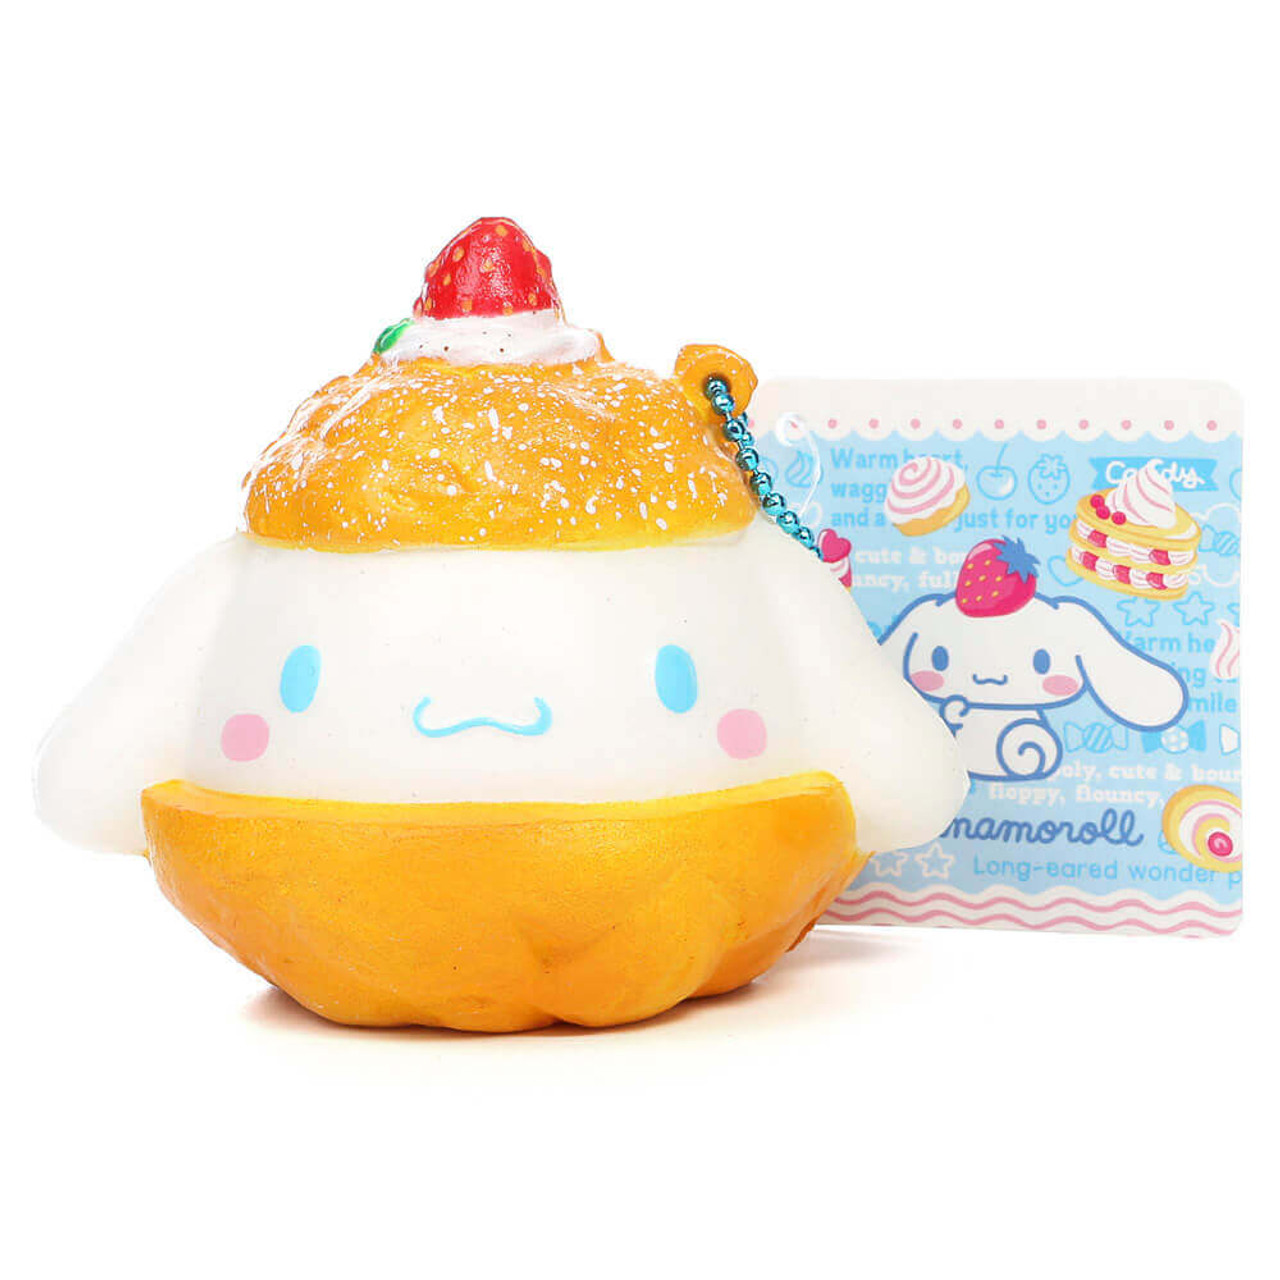 Sanrio Cinnamoroll Kawaii Mascot Puff Cream Dessert Soft Squishy Charm ( Front View )